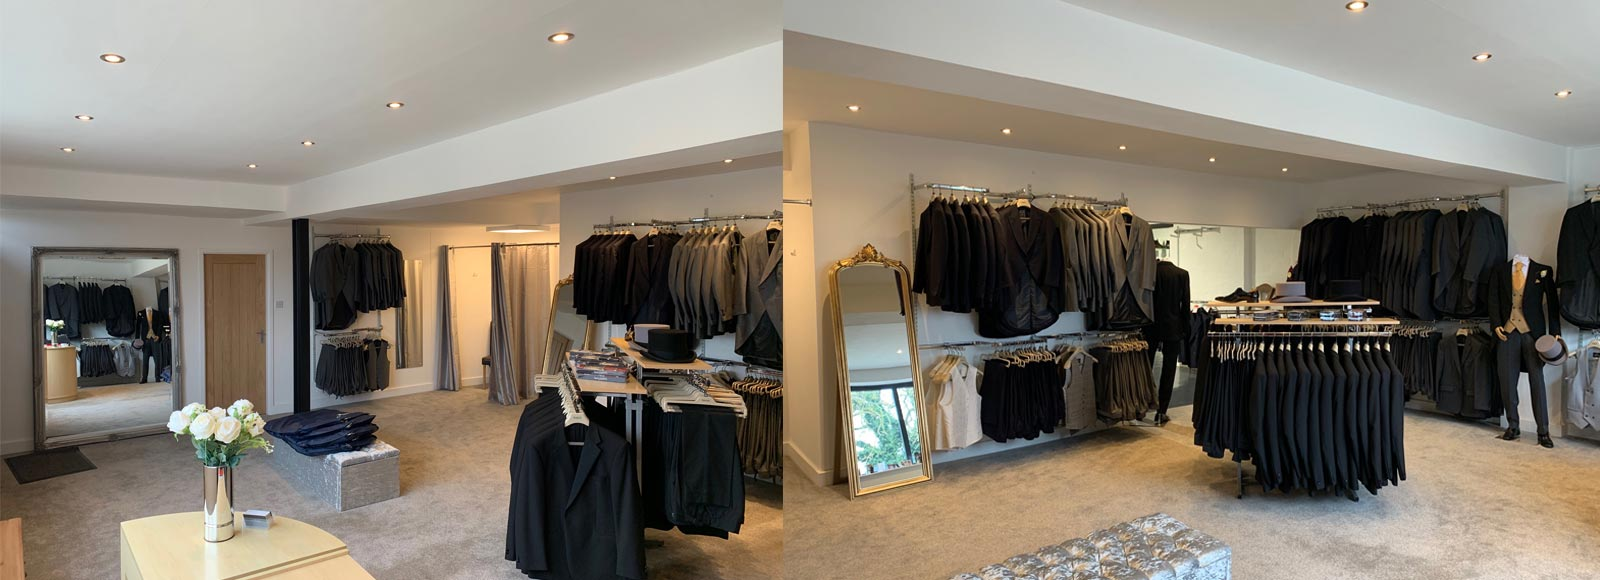 Farleys Wedding Suit Hire Kibworth - Leicestershire